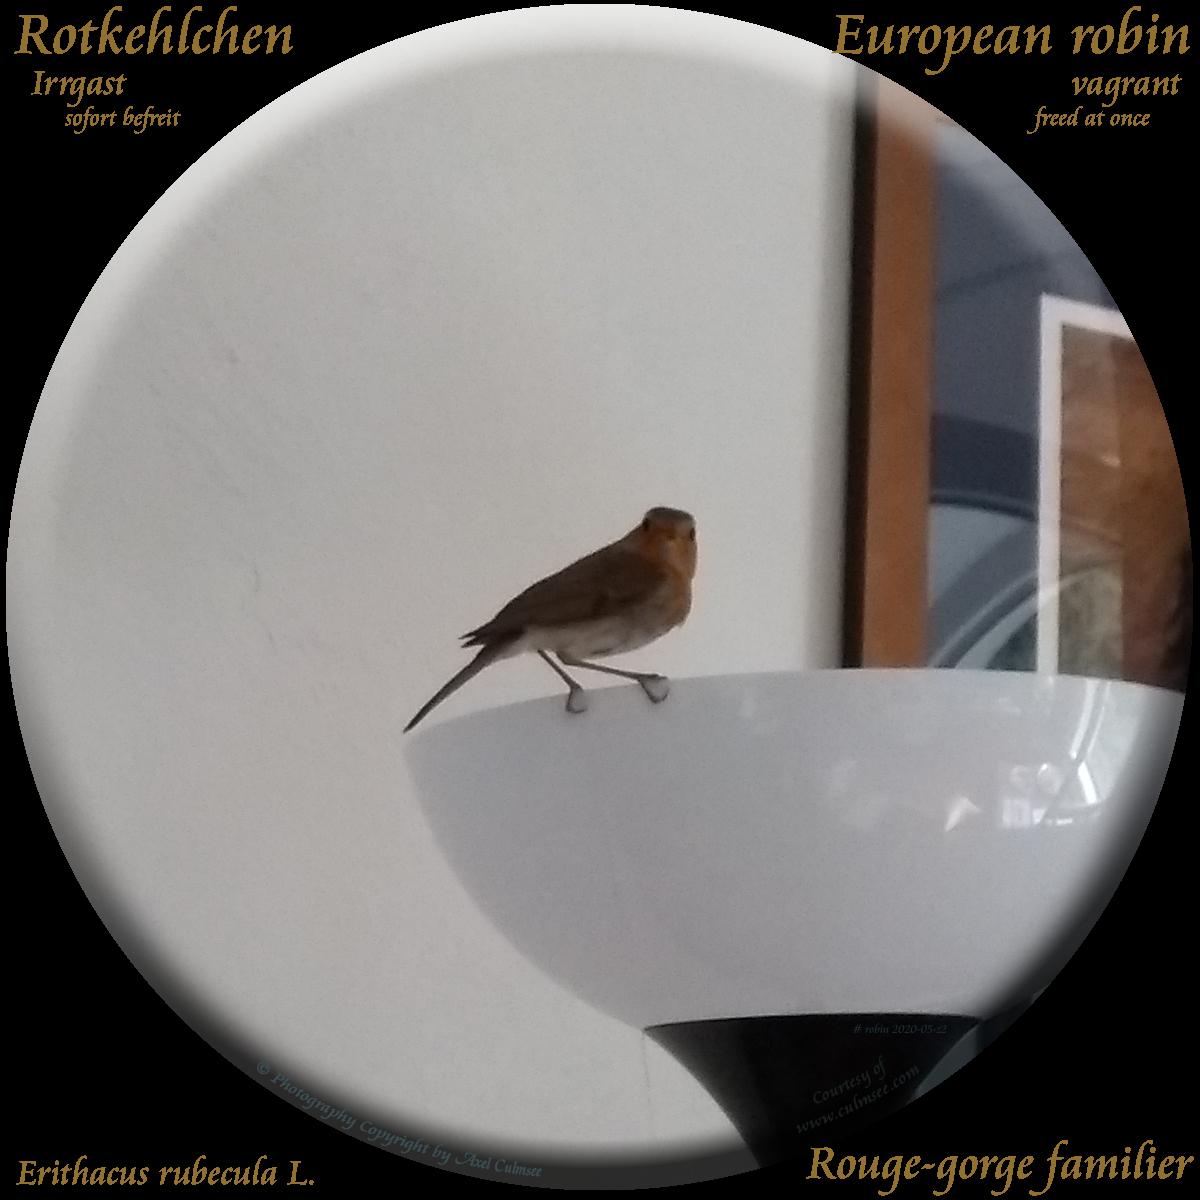 European robin (Erithacus rubecula) Rotkehlchen